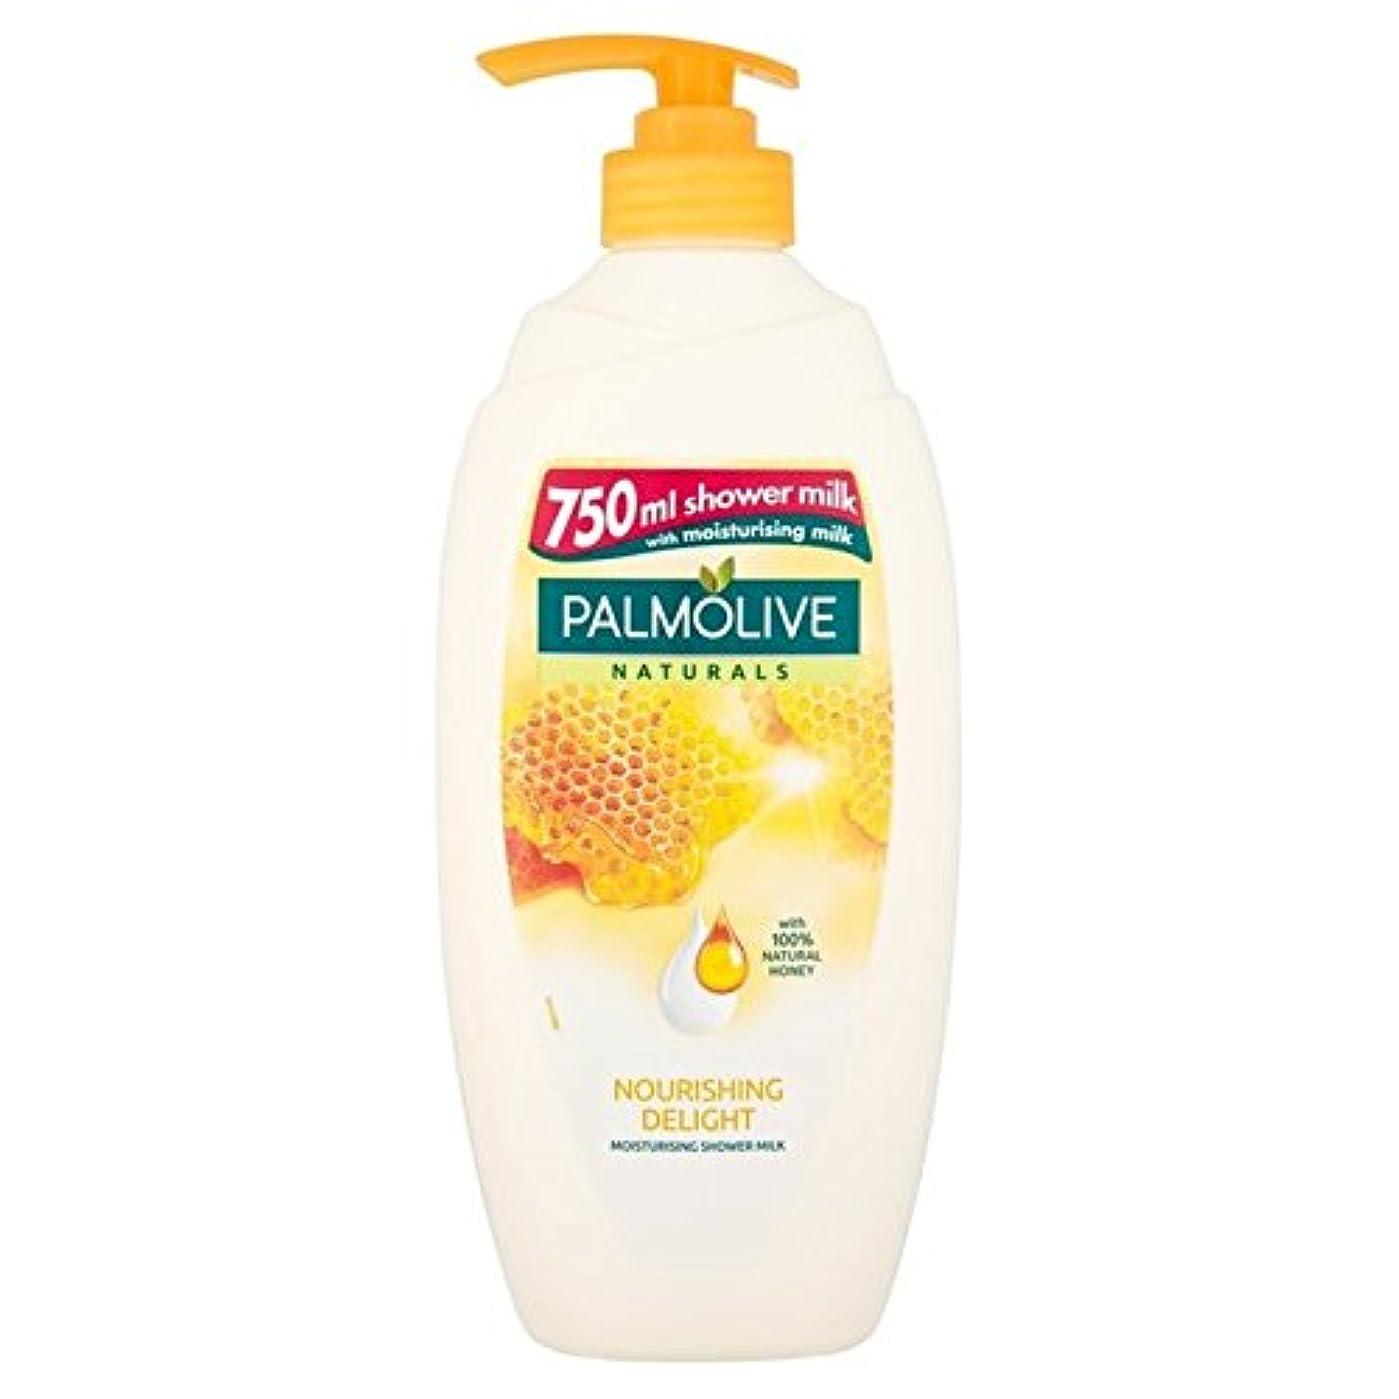 Palmolive Naturals Nourishing Shower Naturals Milk with Honey 750ml - 蜂蜜の750ミリリットルとシャワーナチュラルミルク栄養パルモライブナチュラル [...